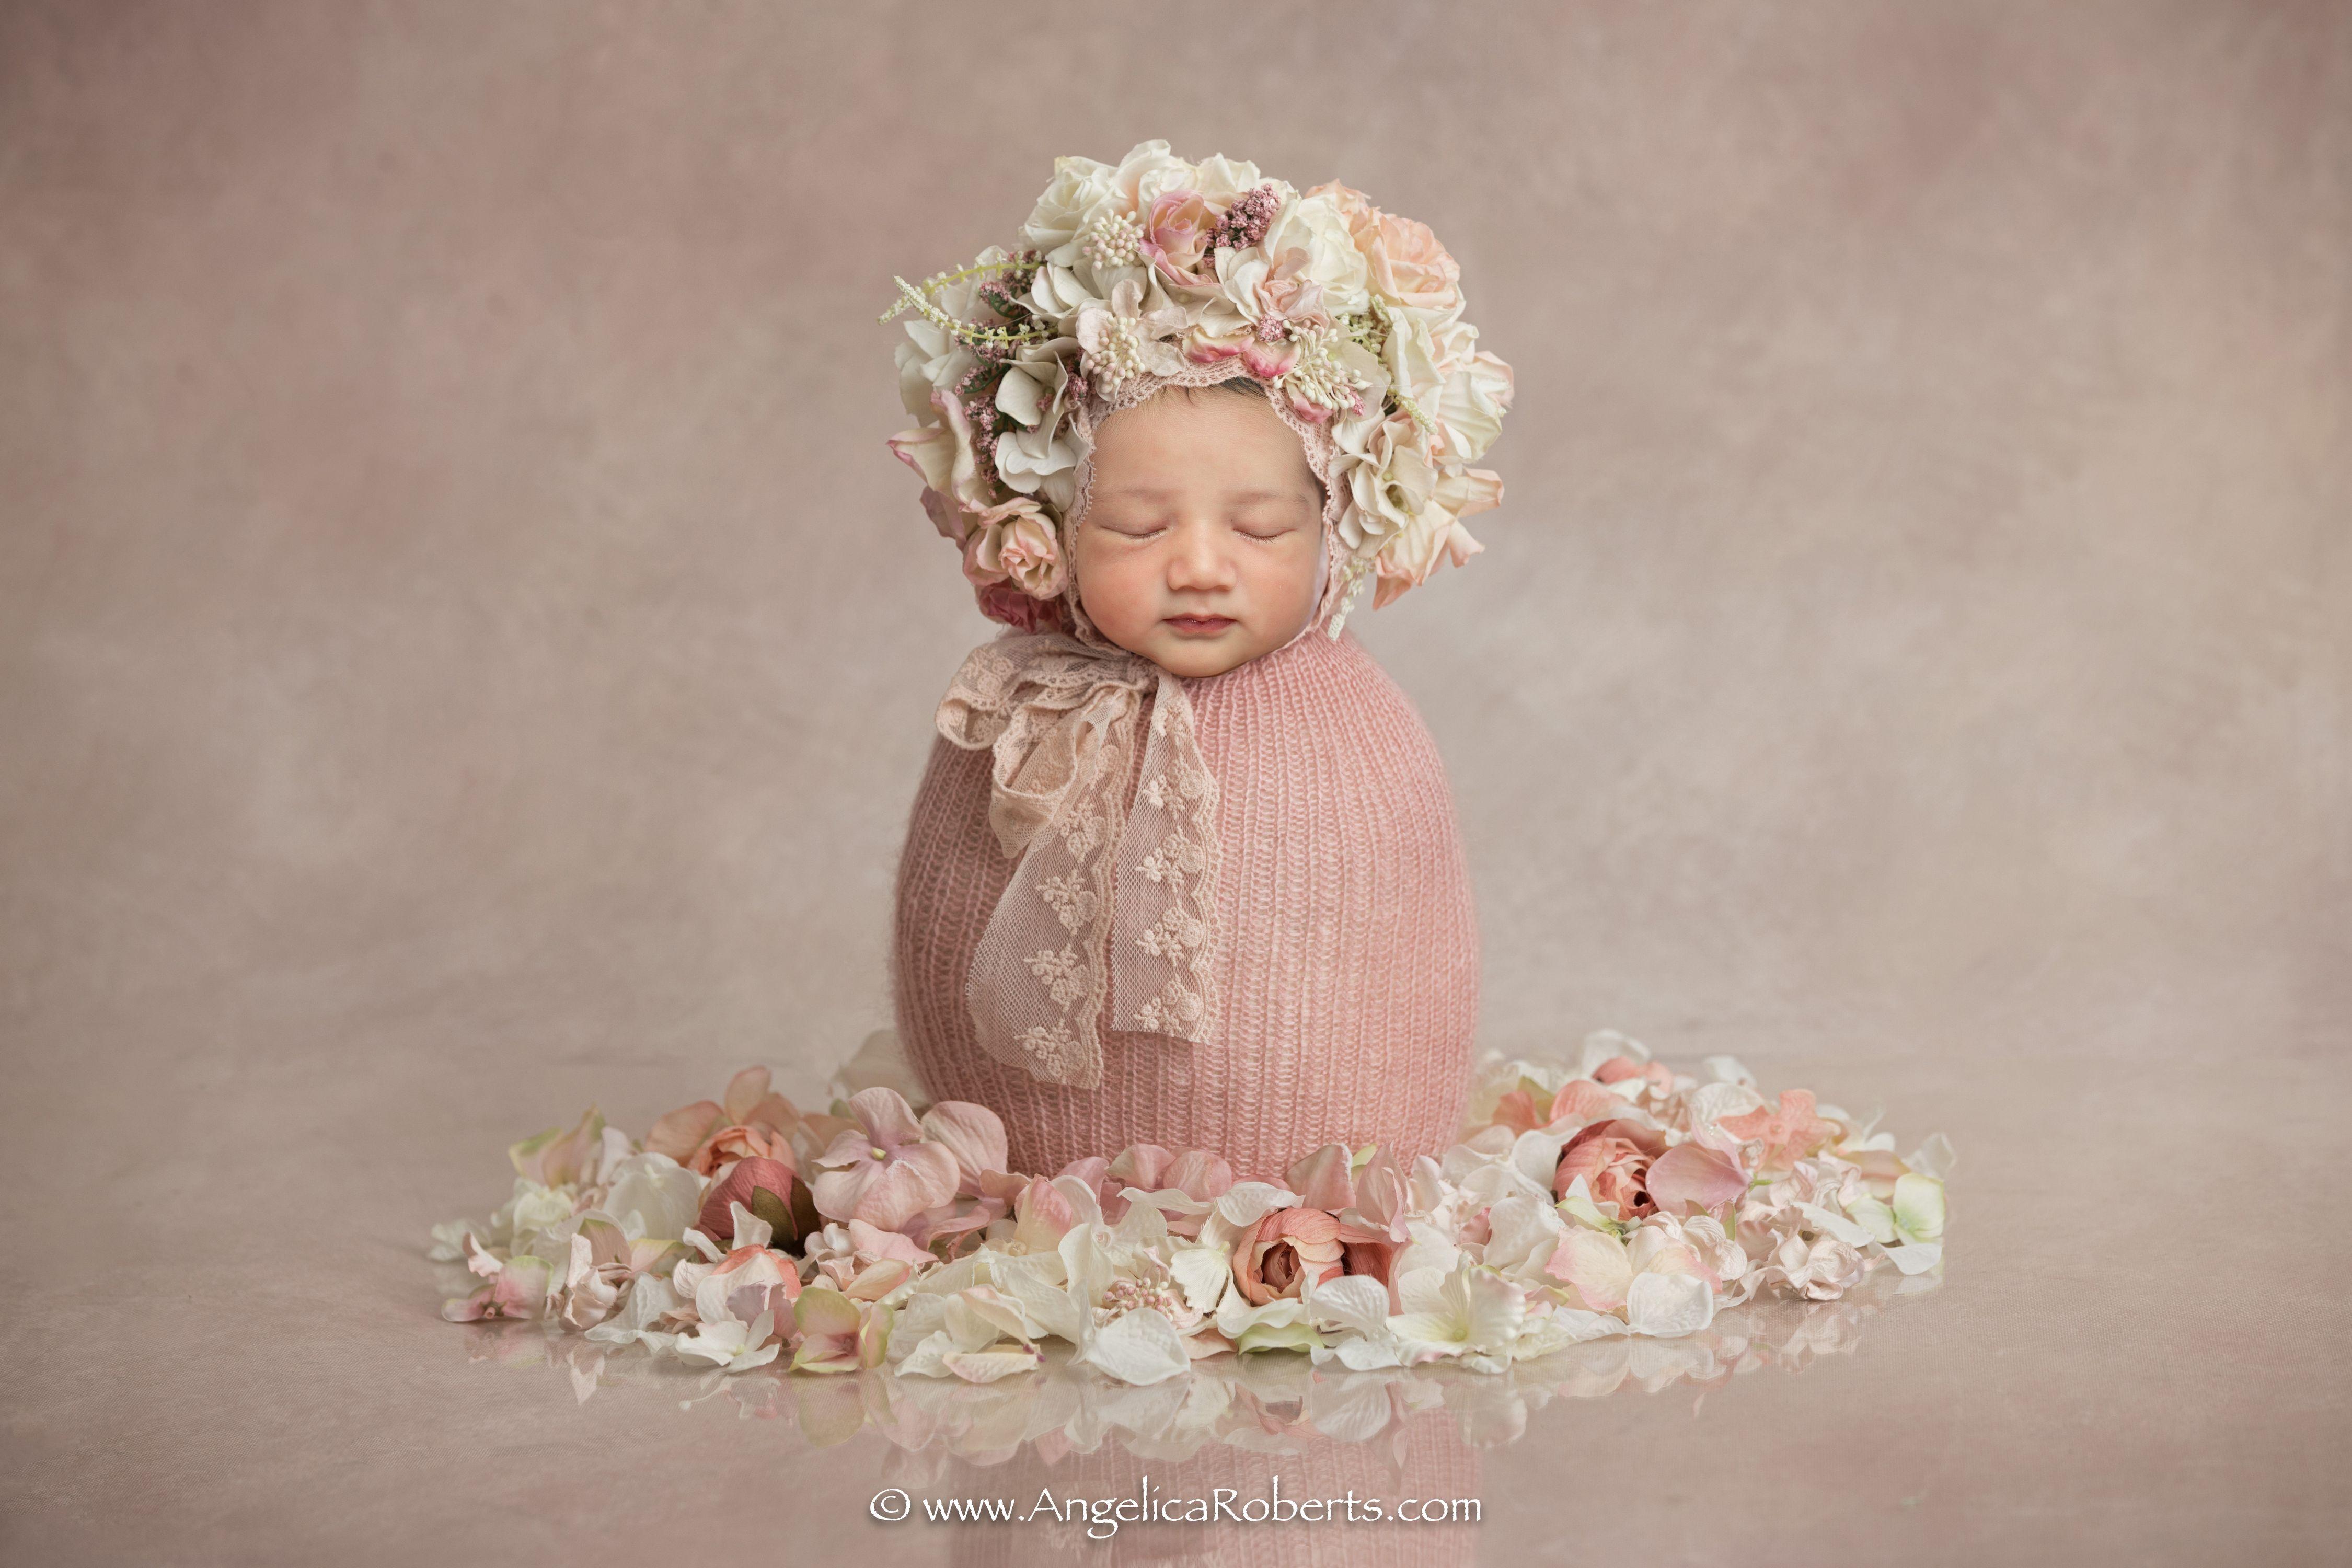 NYC newborn photography - Angelica Roberts Photography.jpg